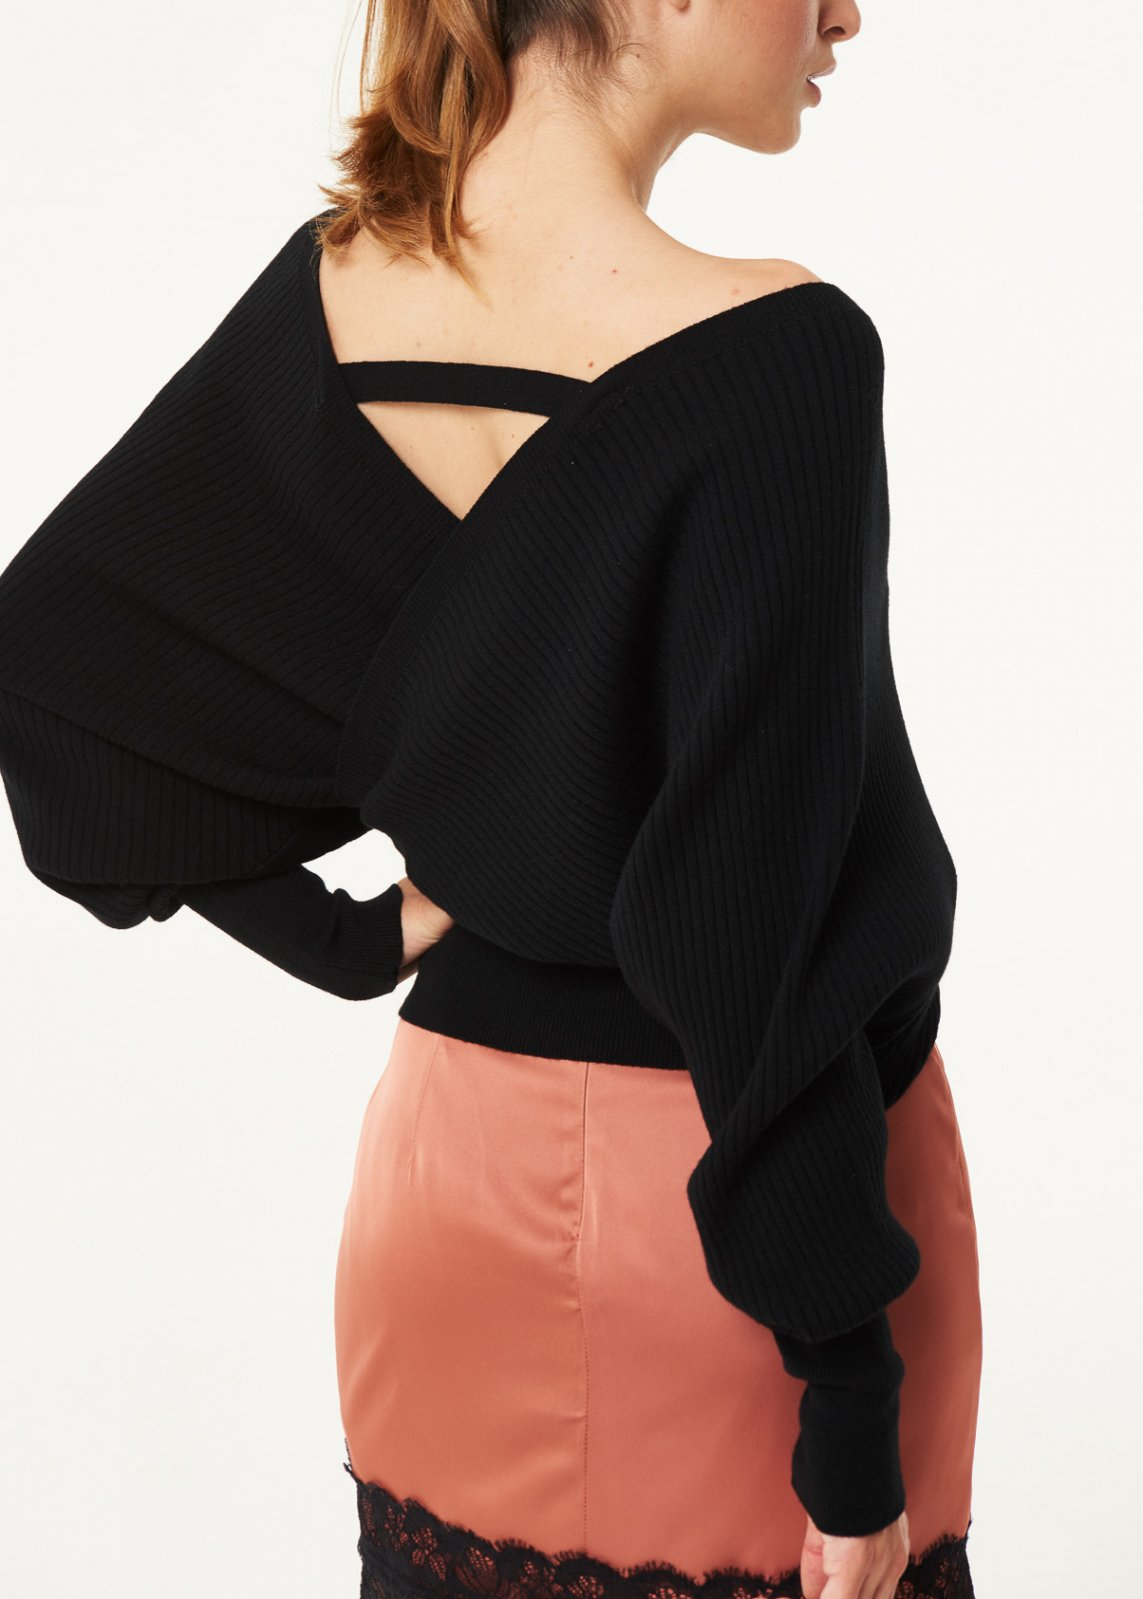 Crossover wool sweater DENNY ROSE |  | DD500162001